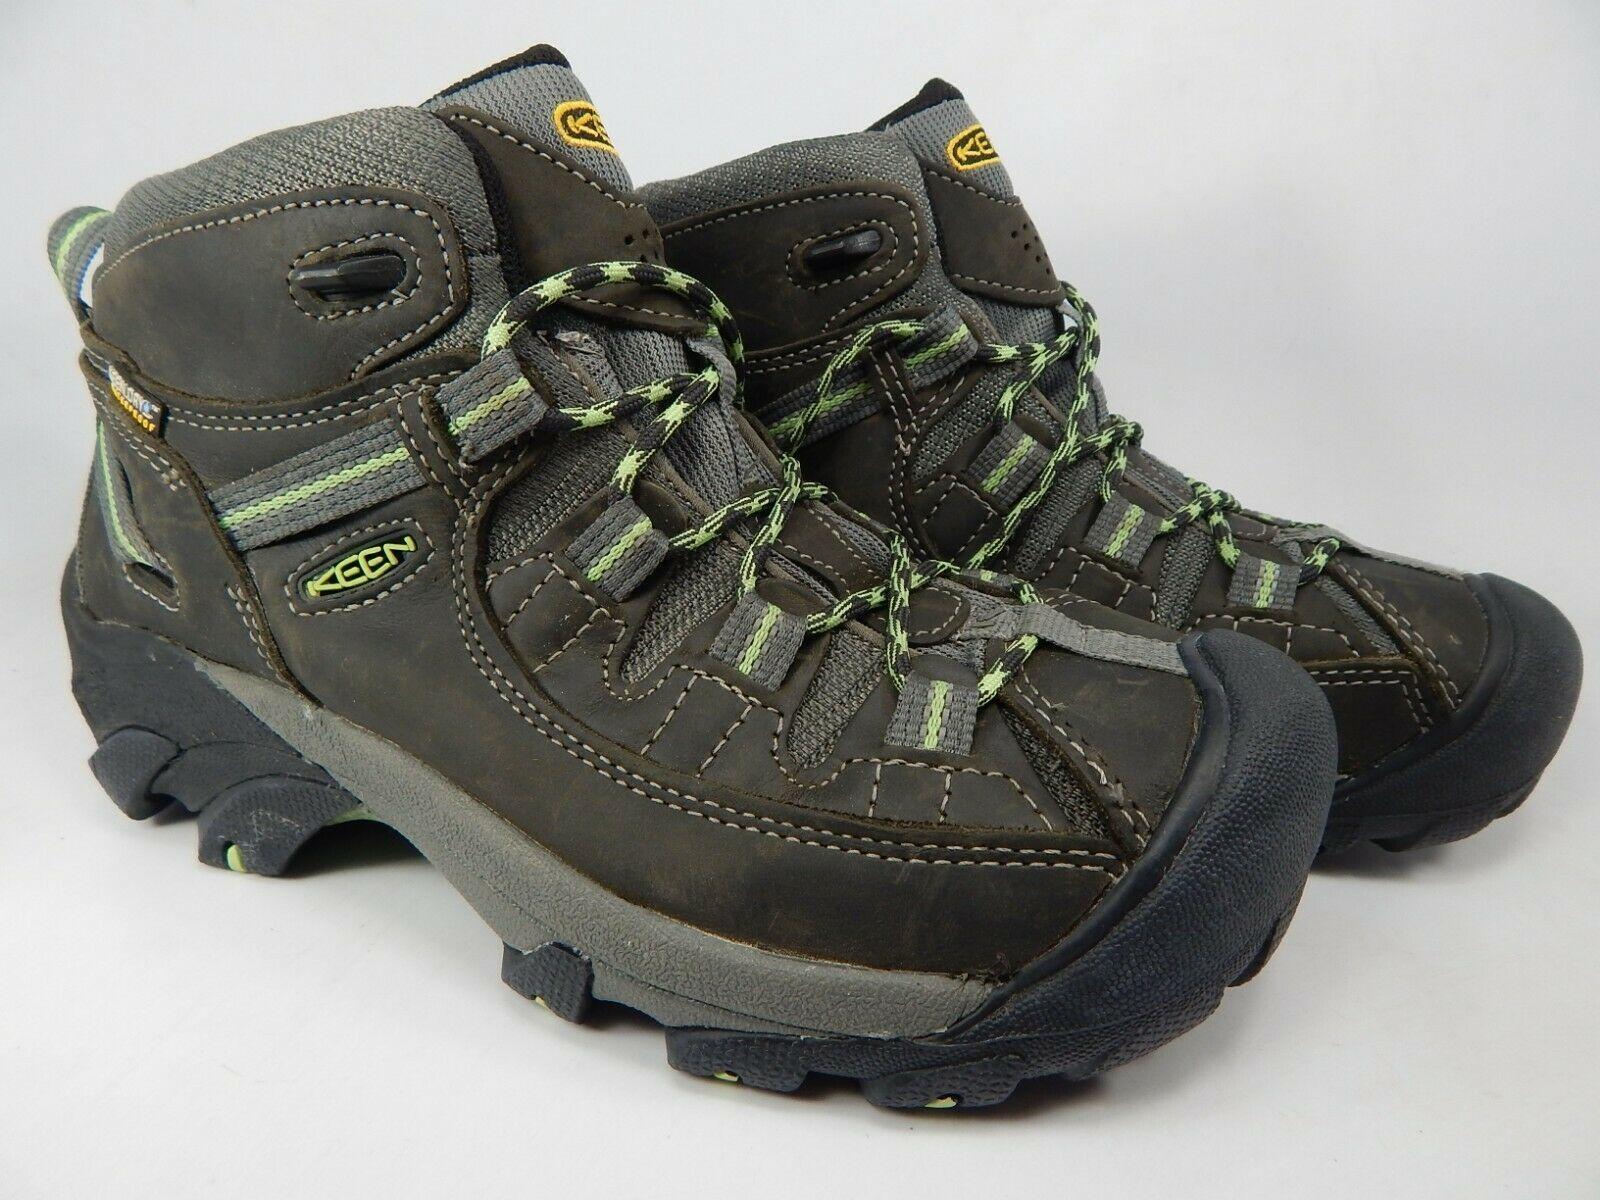 Keen Targhee II Mid Size 8 M (B) EU 38.5 Women's WP Trail Hiking Boots 1014997